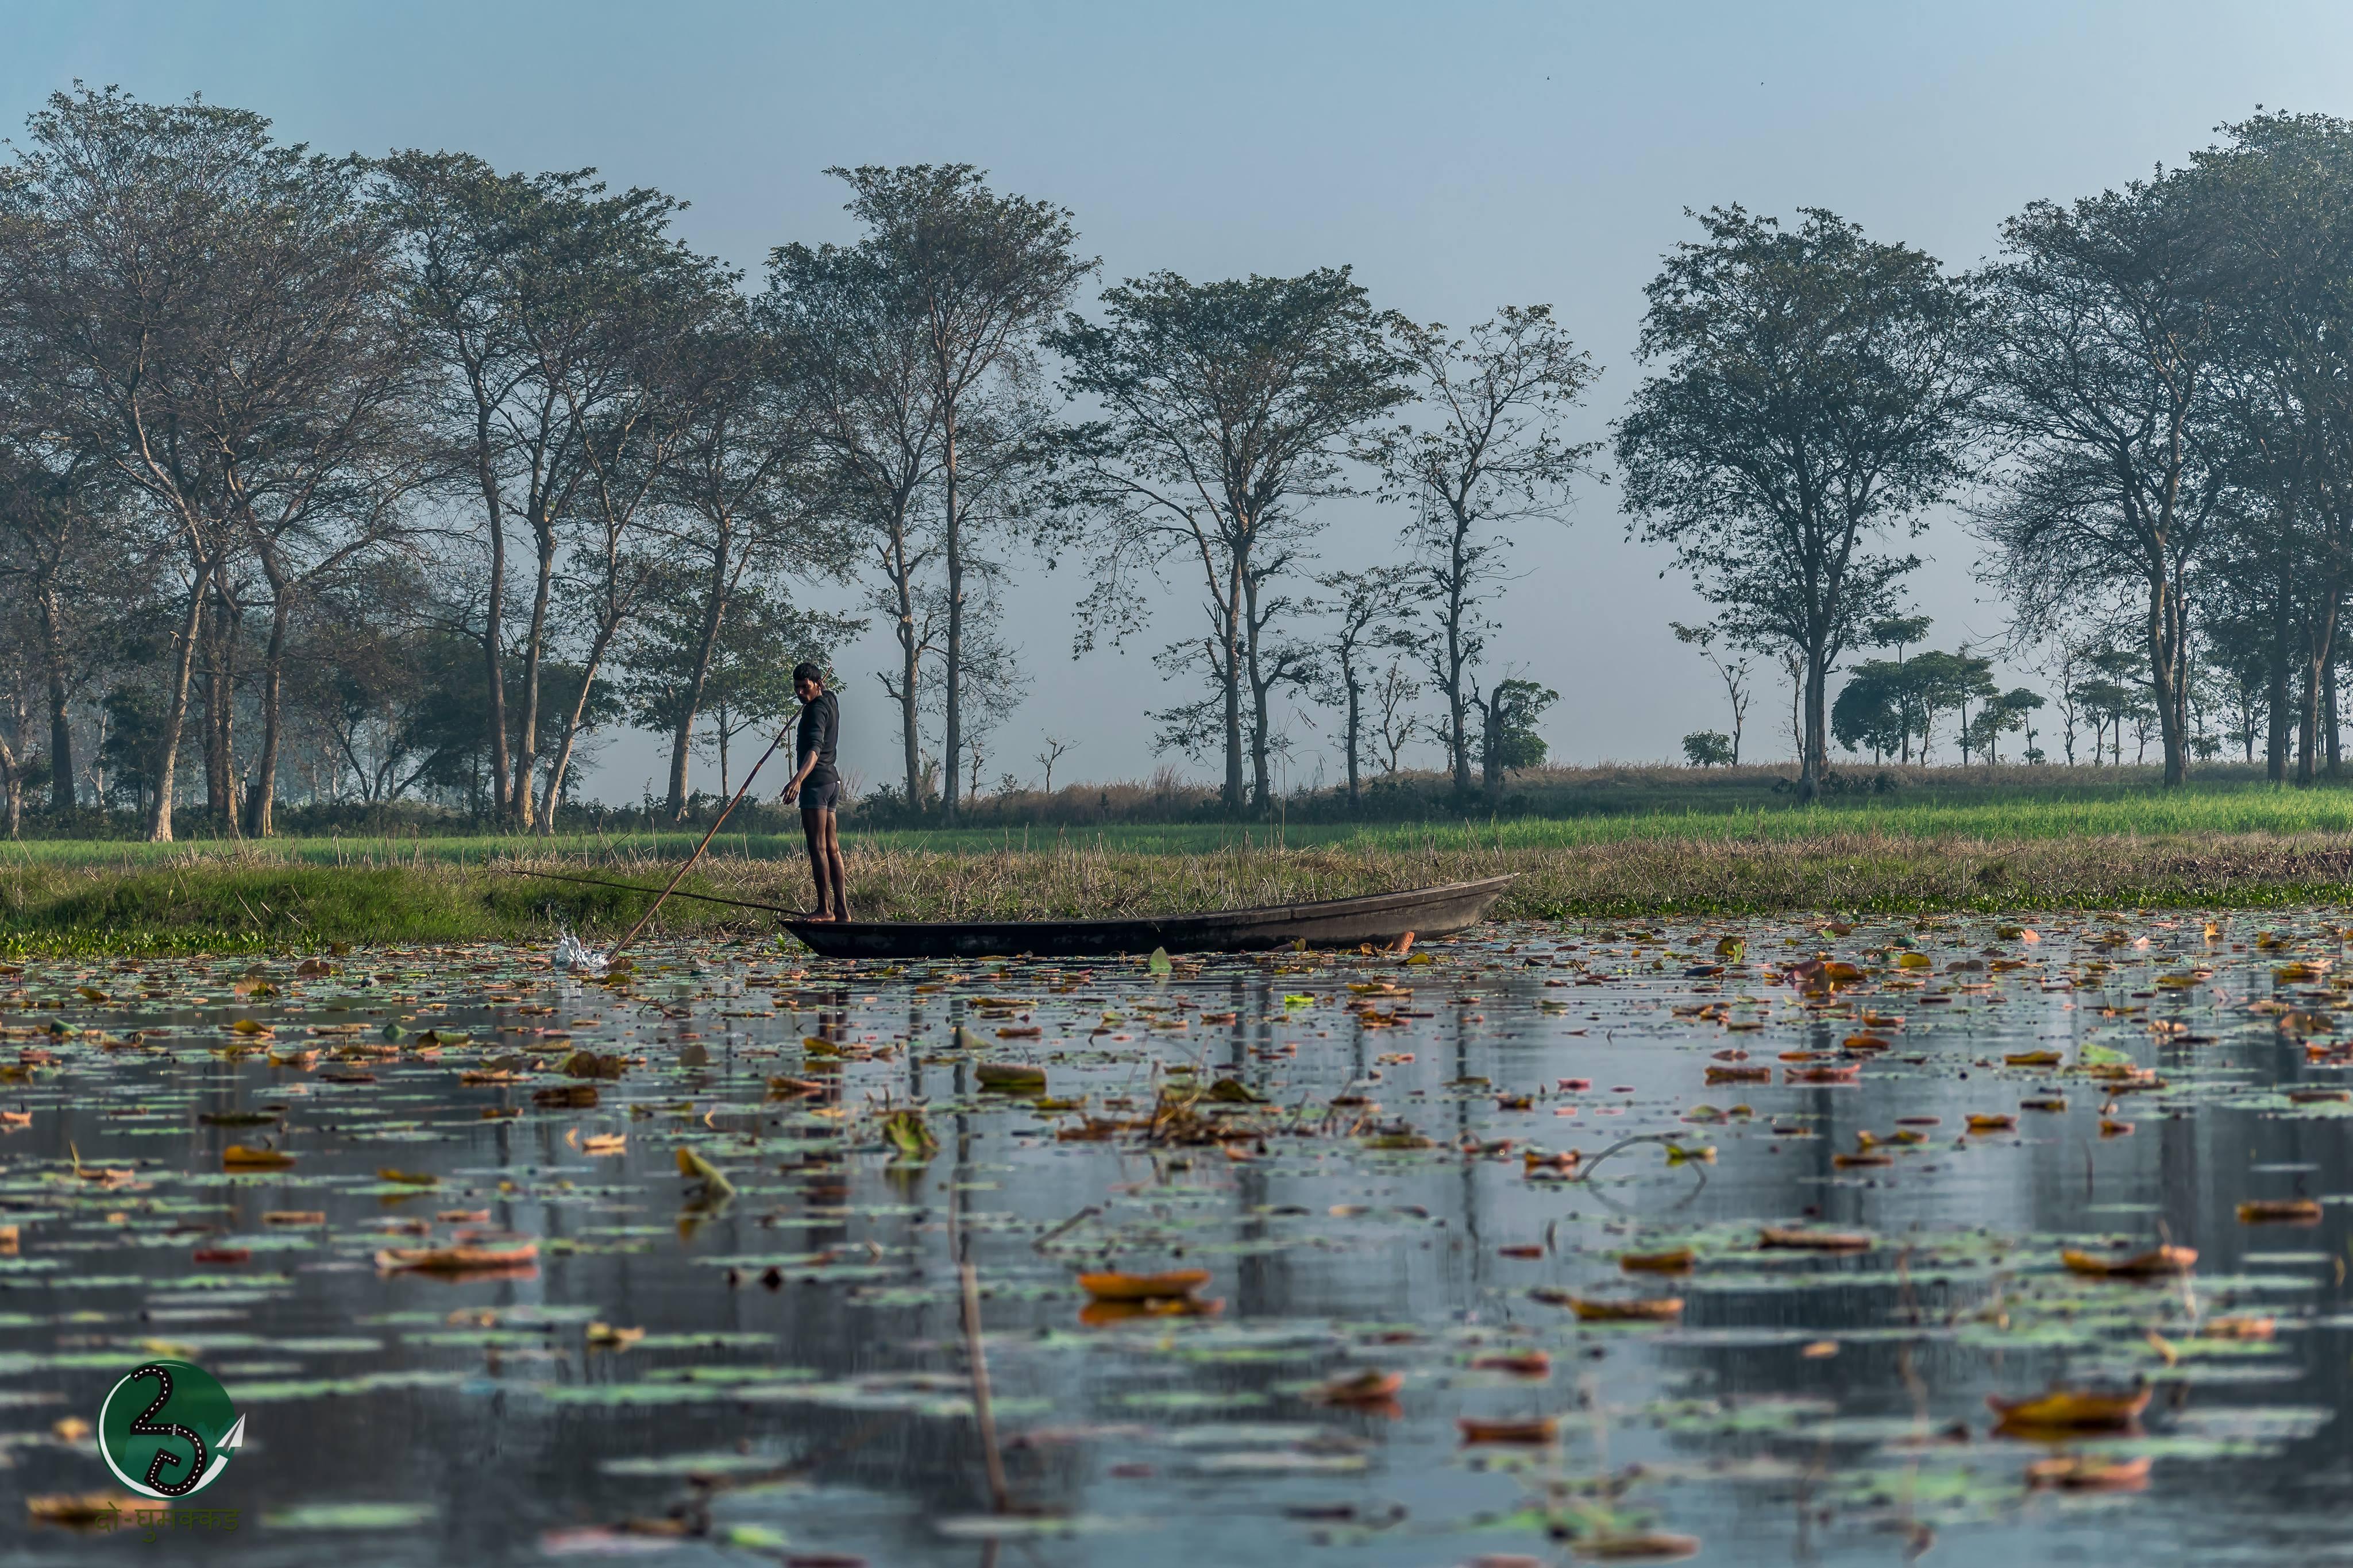 Read about Kanwar, a dying lake through the Lenses of 2 Ghumakkar